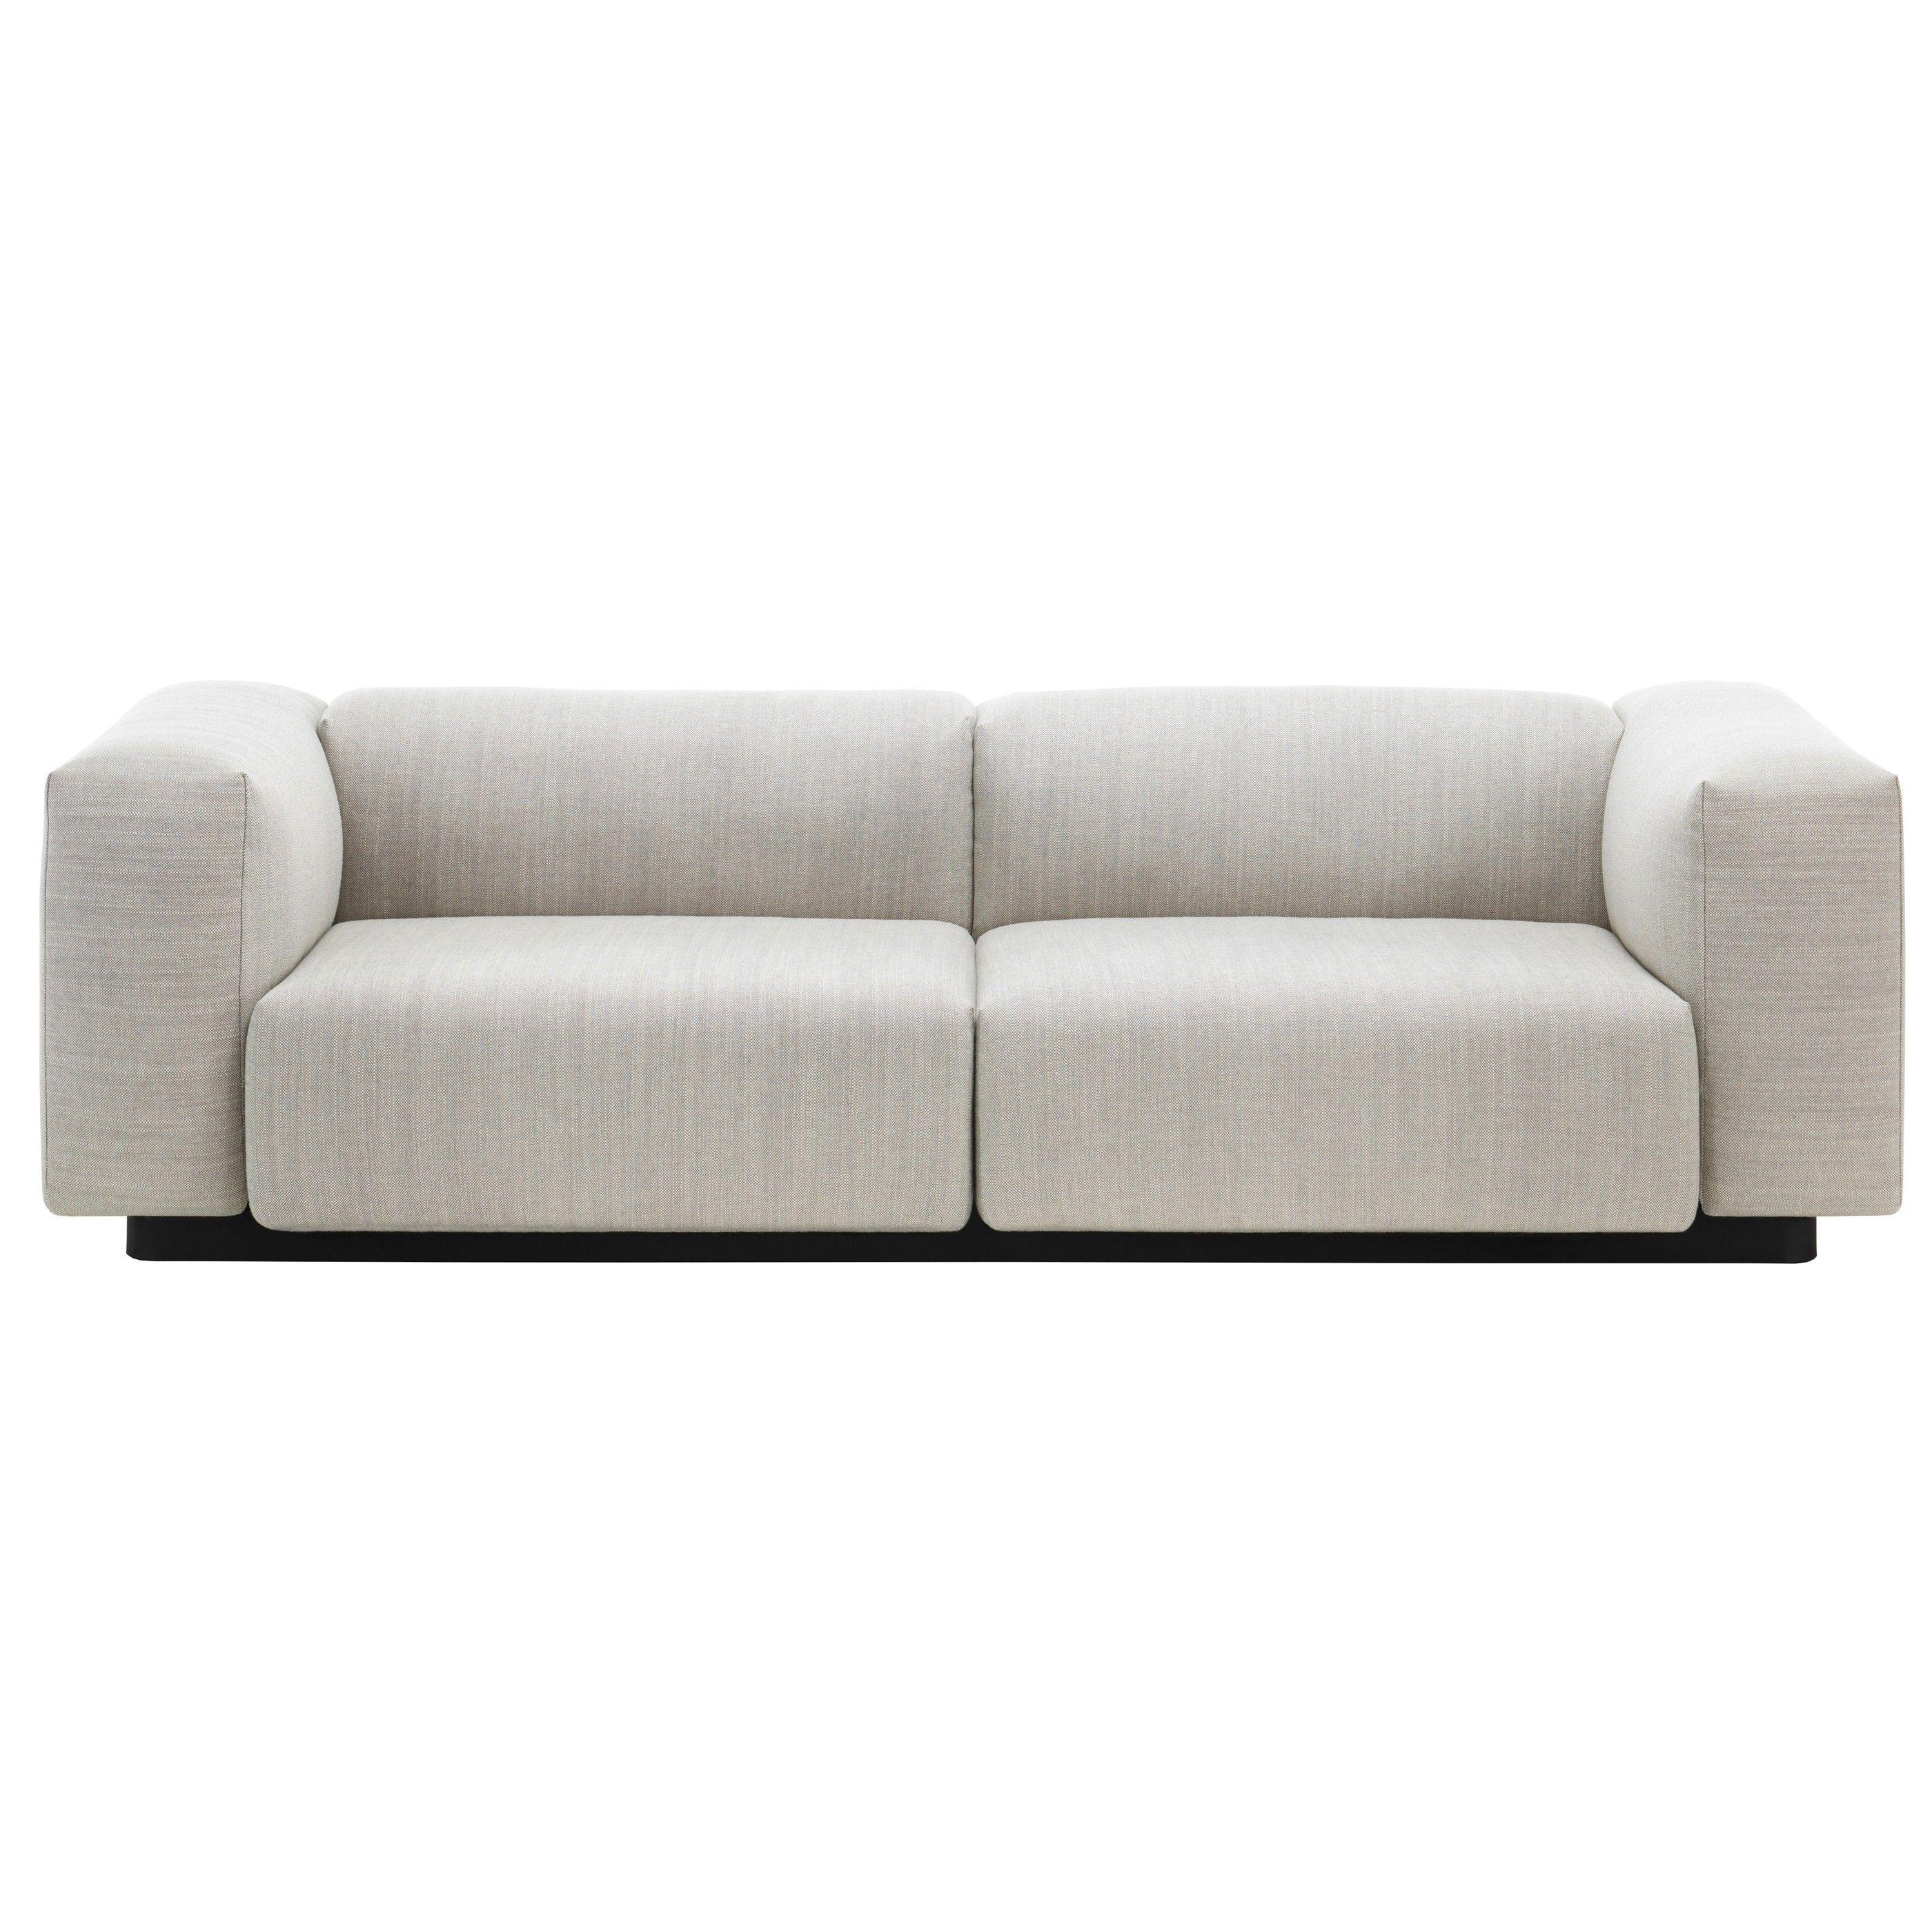 2 Zits Bank Design.Soft Modular Bank 2 Zits Vitra Modular Sofa Types Of Sofas